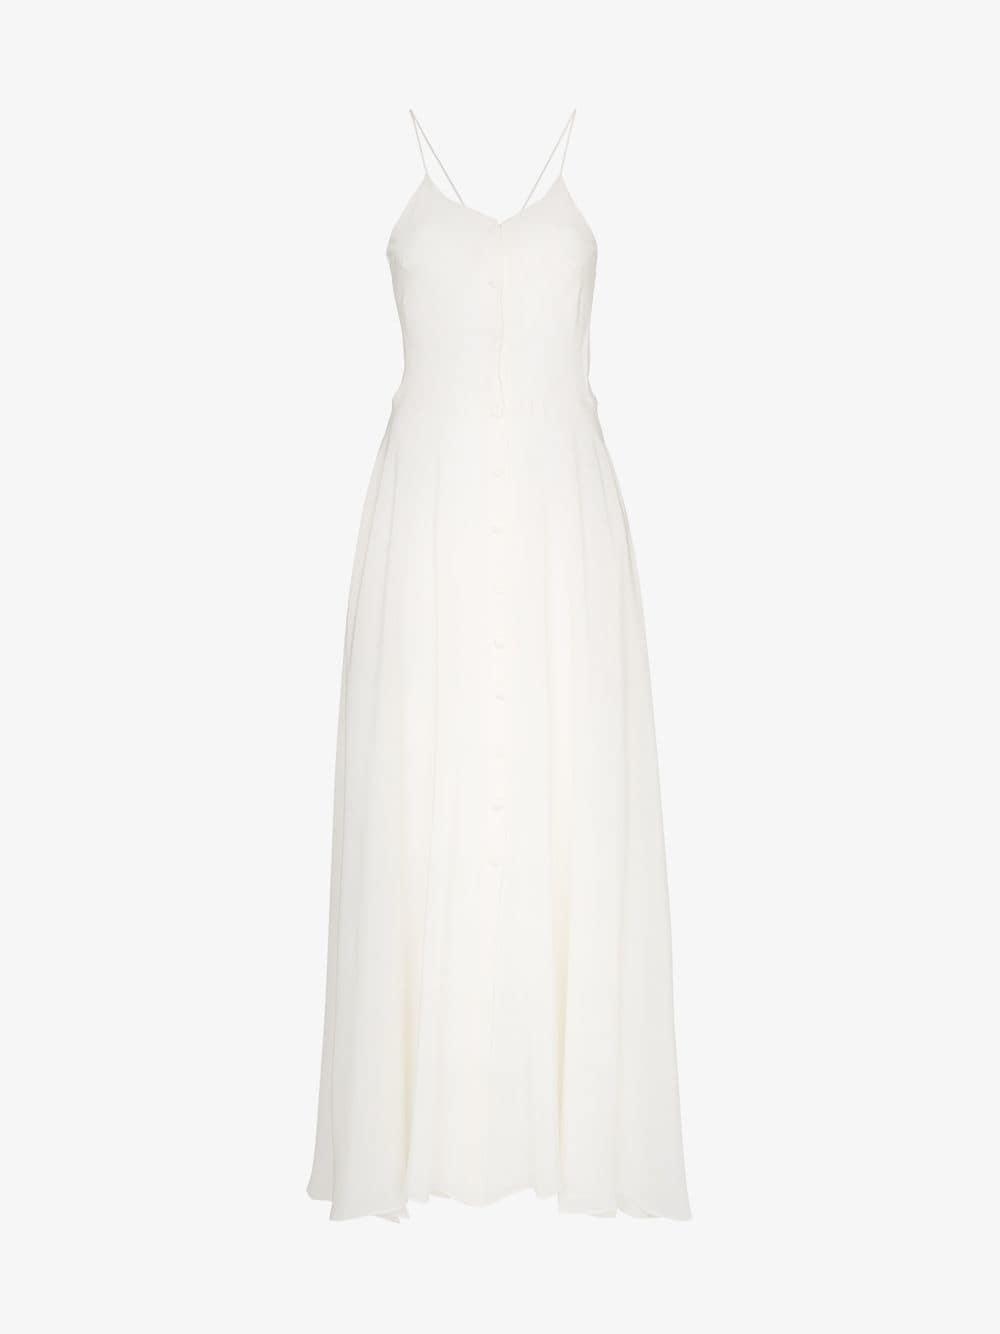 Deitas Olivia V-neck silk dress in white